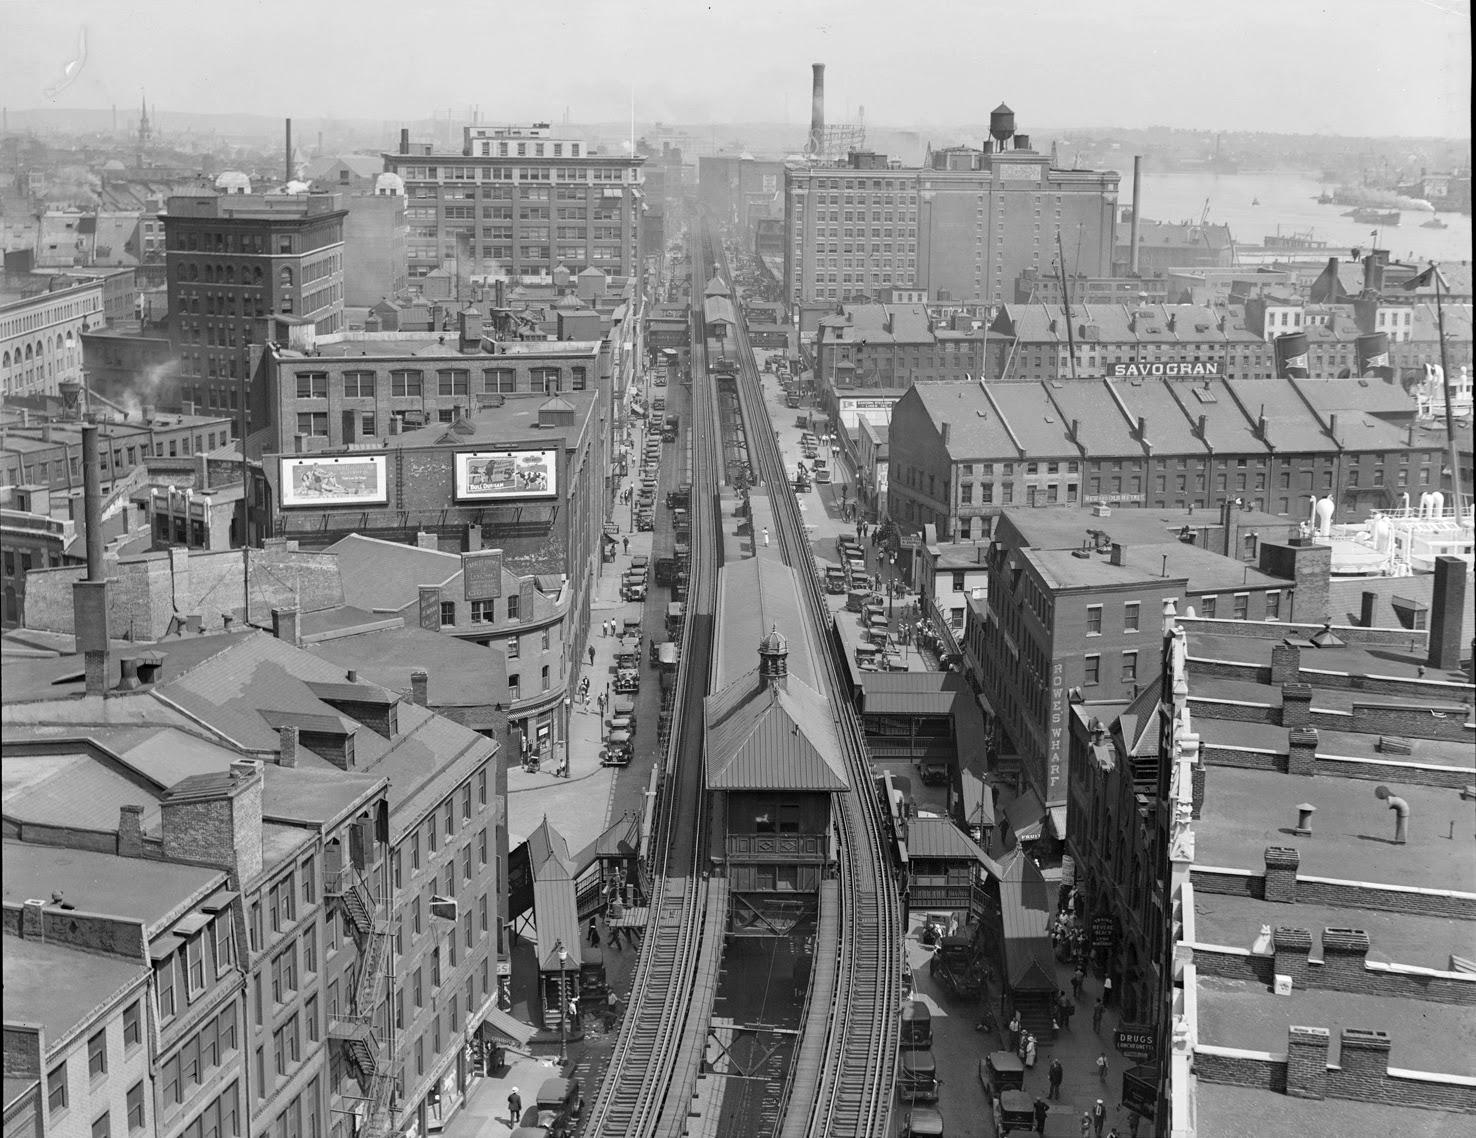 The Atlantic Avenue Elevated railway near Rowe's Wharf, looking north, July 21, 1932  [photo © Leslie Jones via BPL Digital Commonwealth Project]